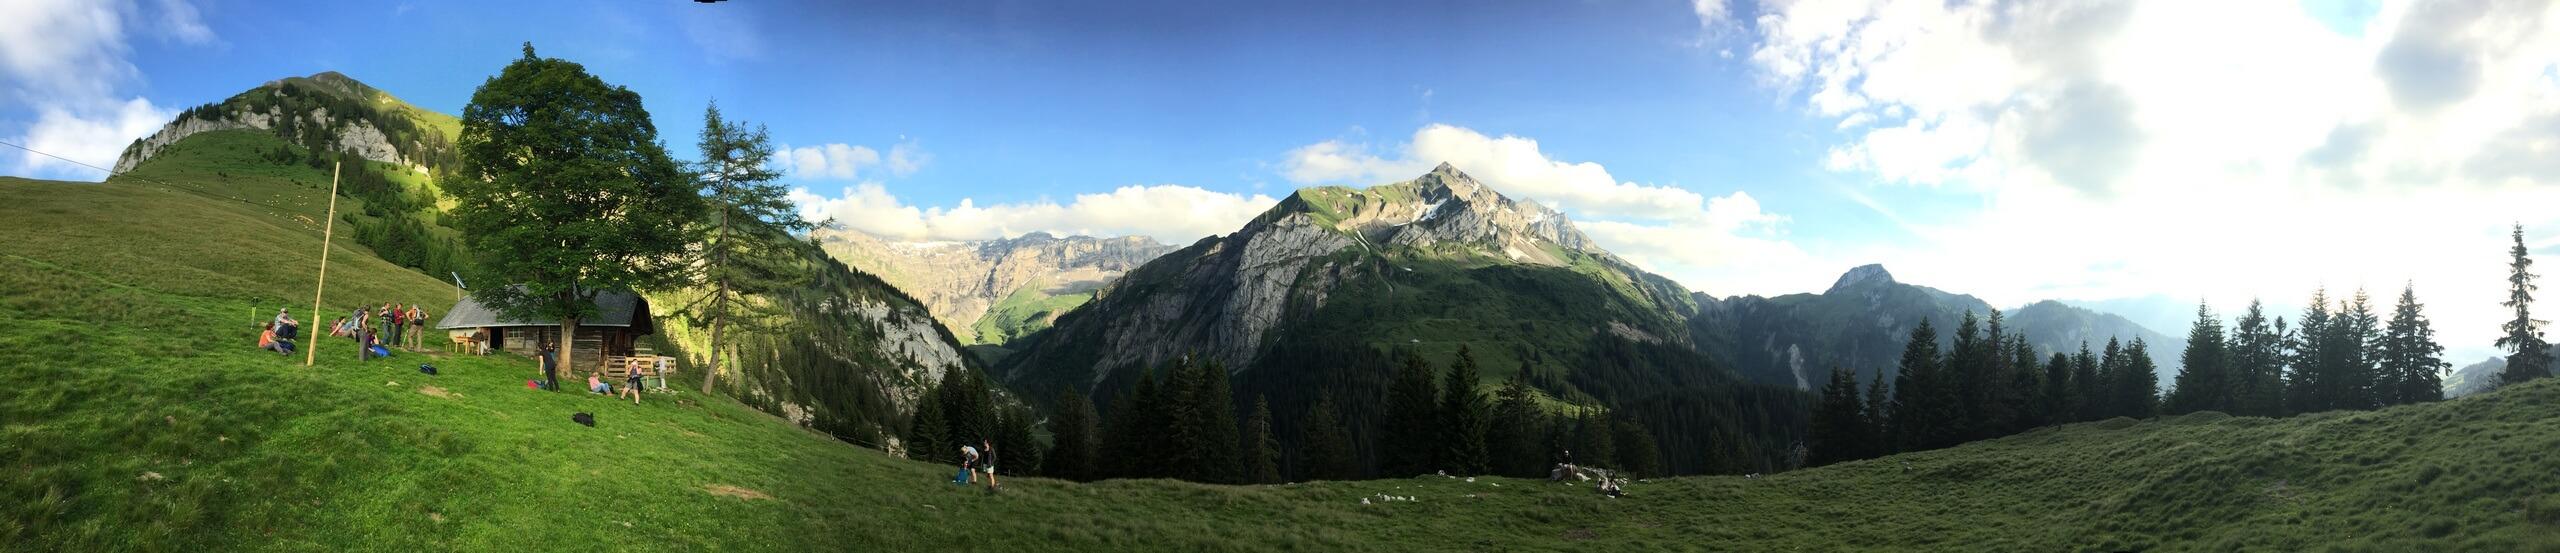 aeschi-alp-brunni-sommer-panorama